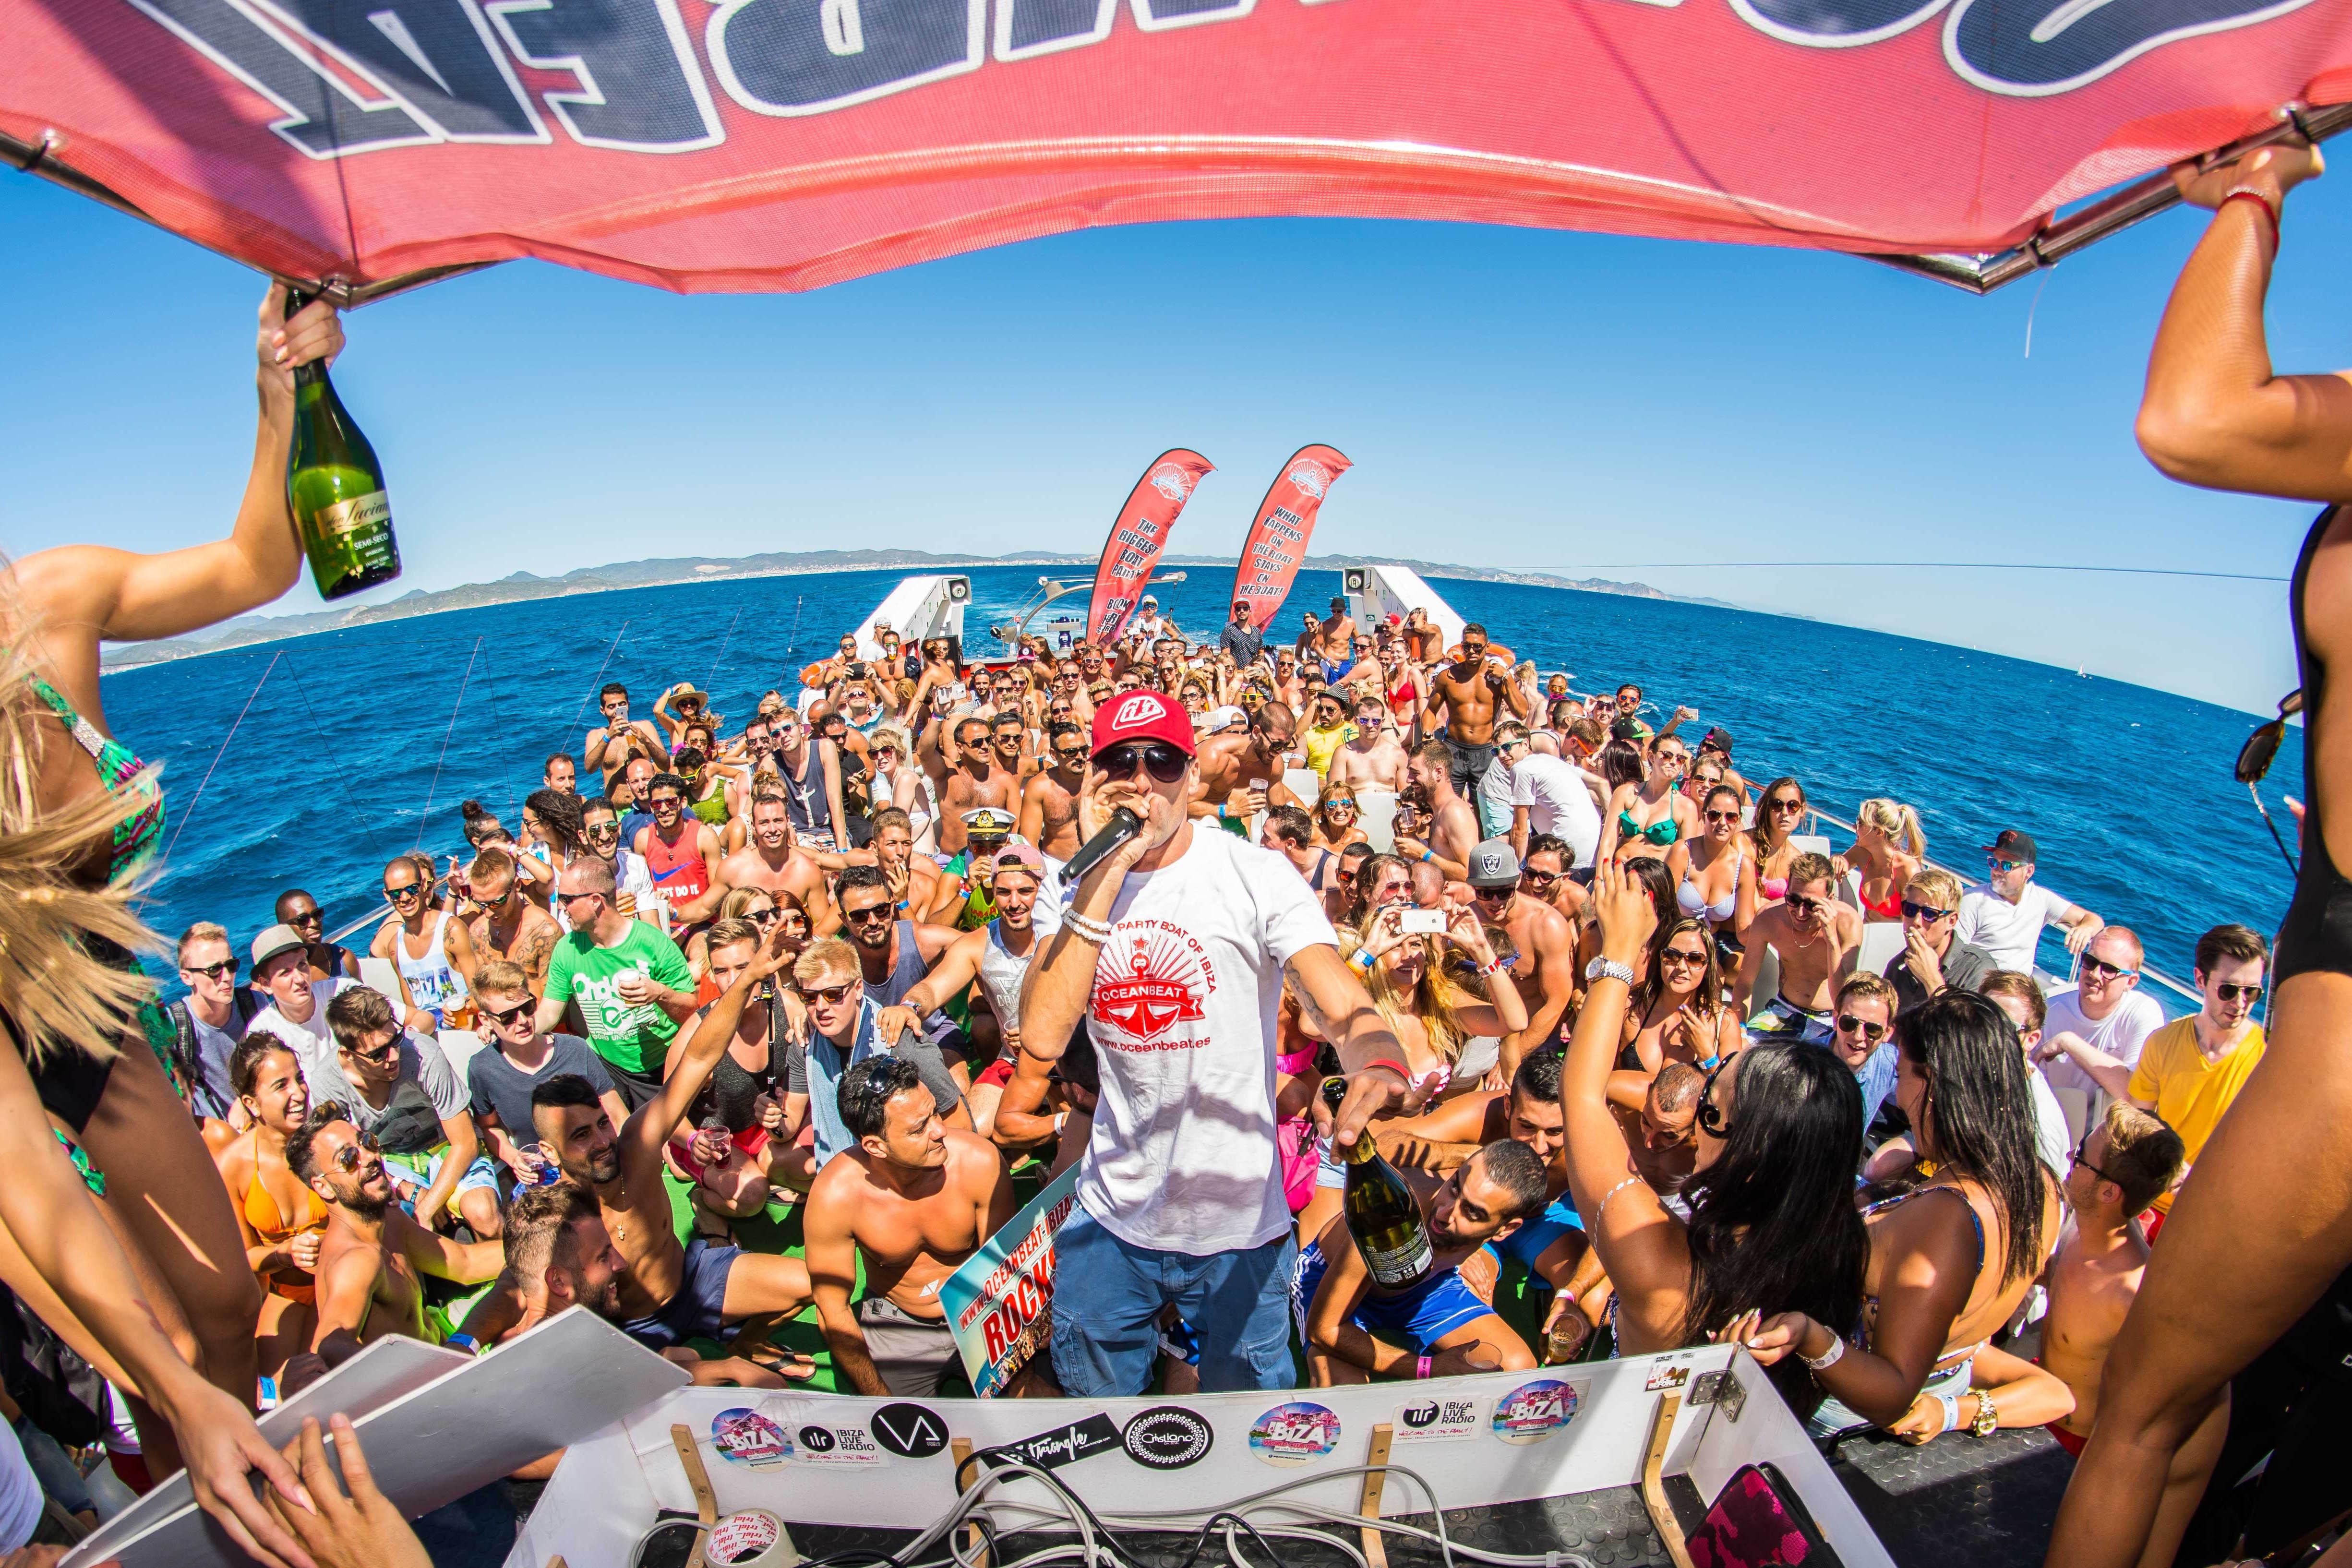 Imprezy na statku – Oceanbeat Ibiza Boat Party